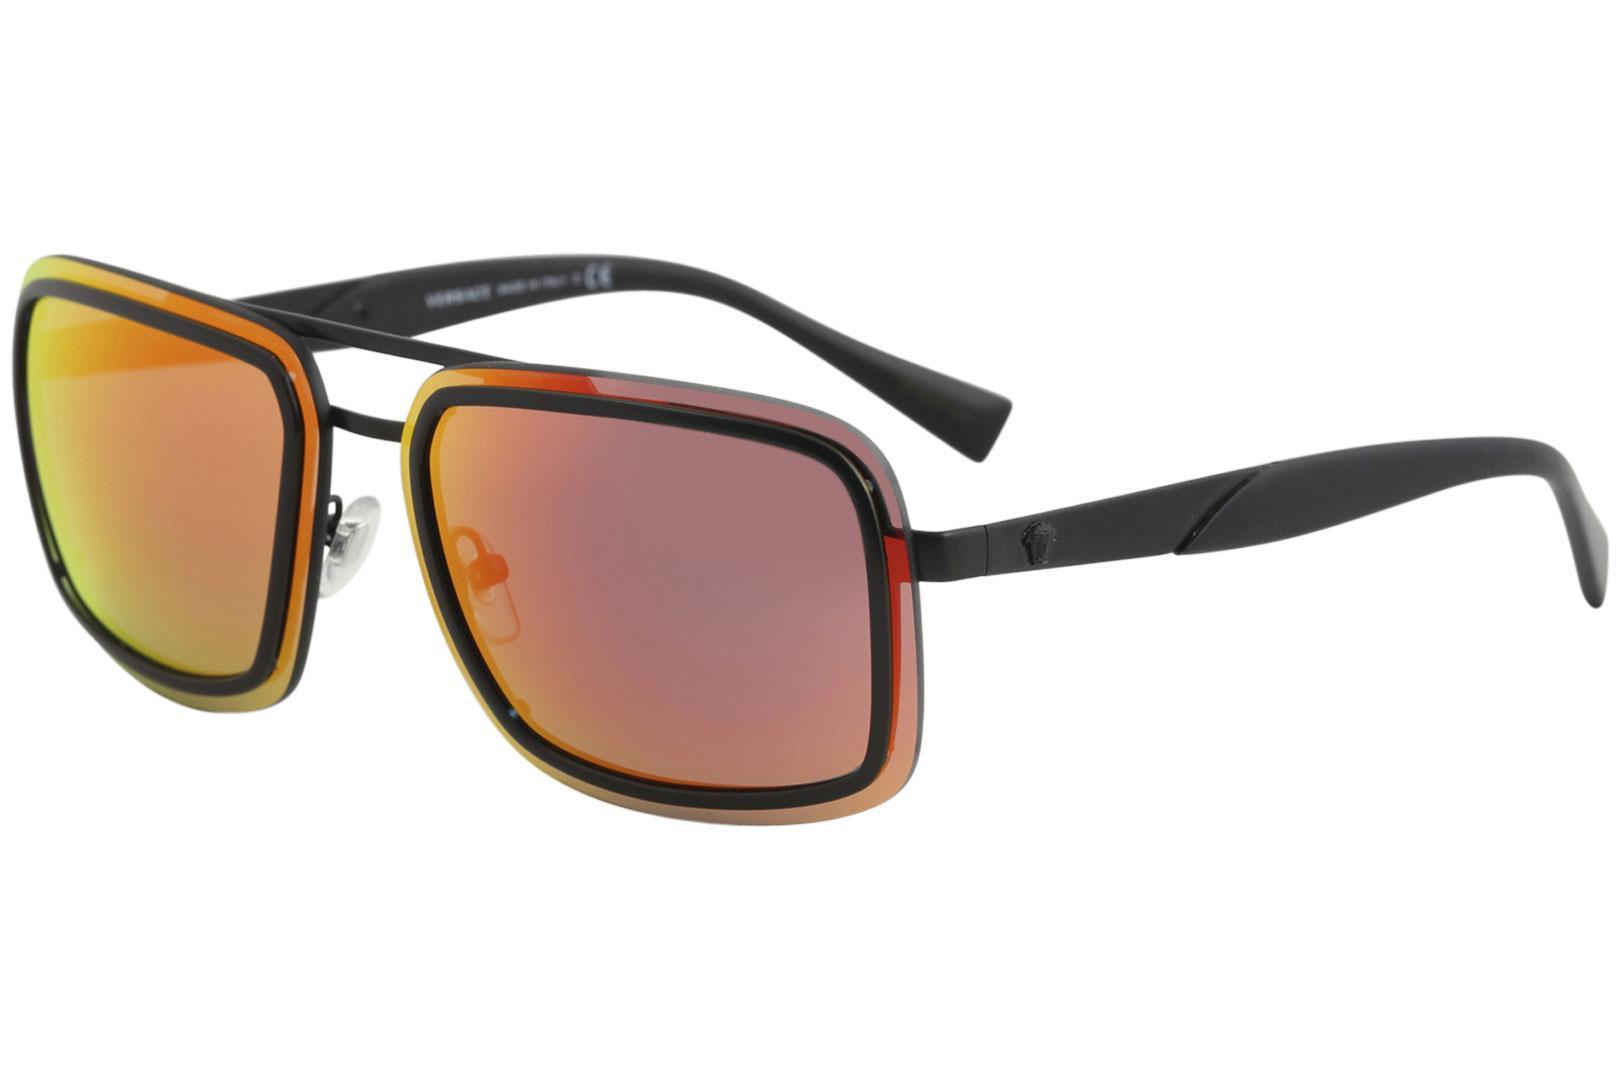 e152b8cd135e Versace Men s VE2183 VE 2183 Fashion Square Sunglasses by Versace